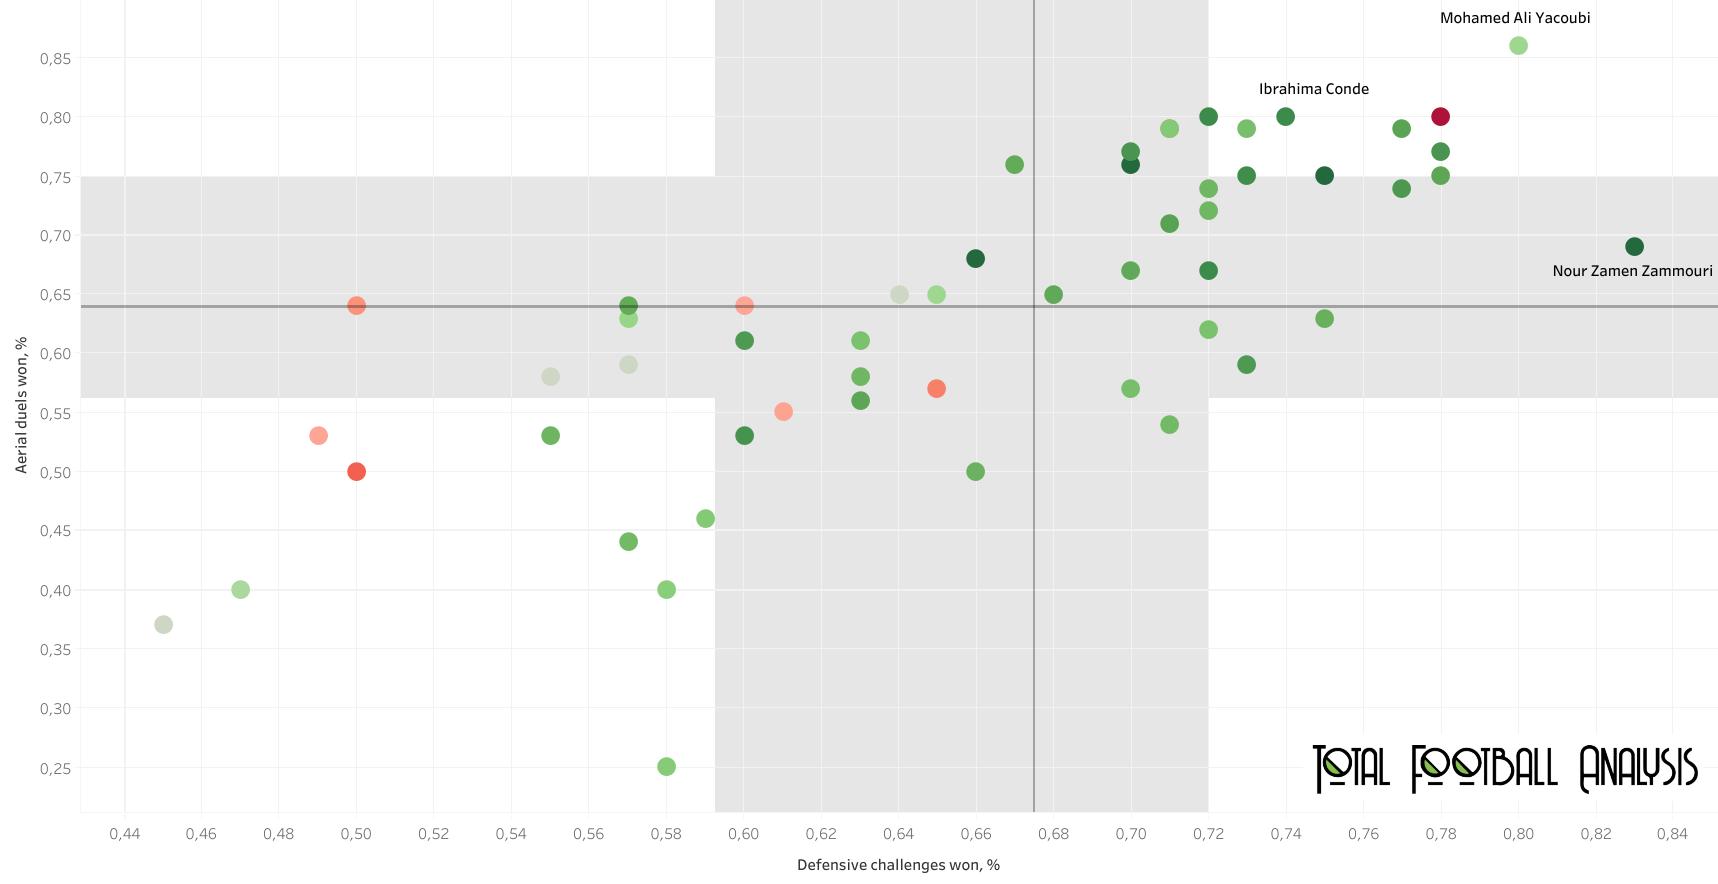 CAF Champions League 2020/21 - data analysis statistics